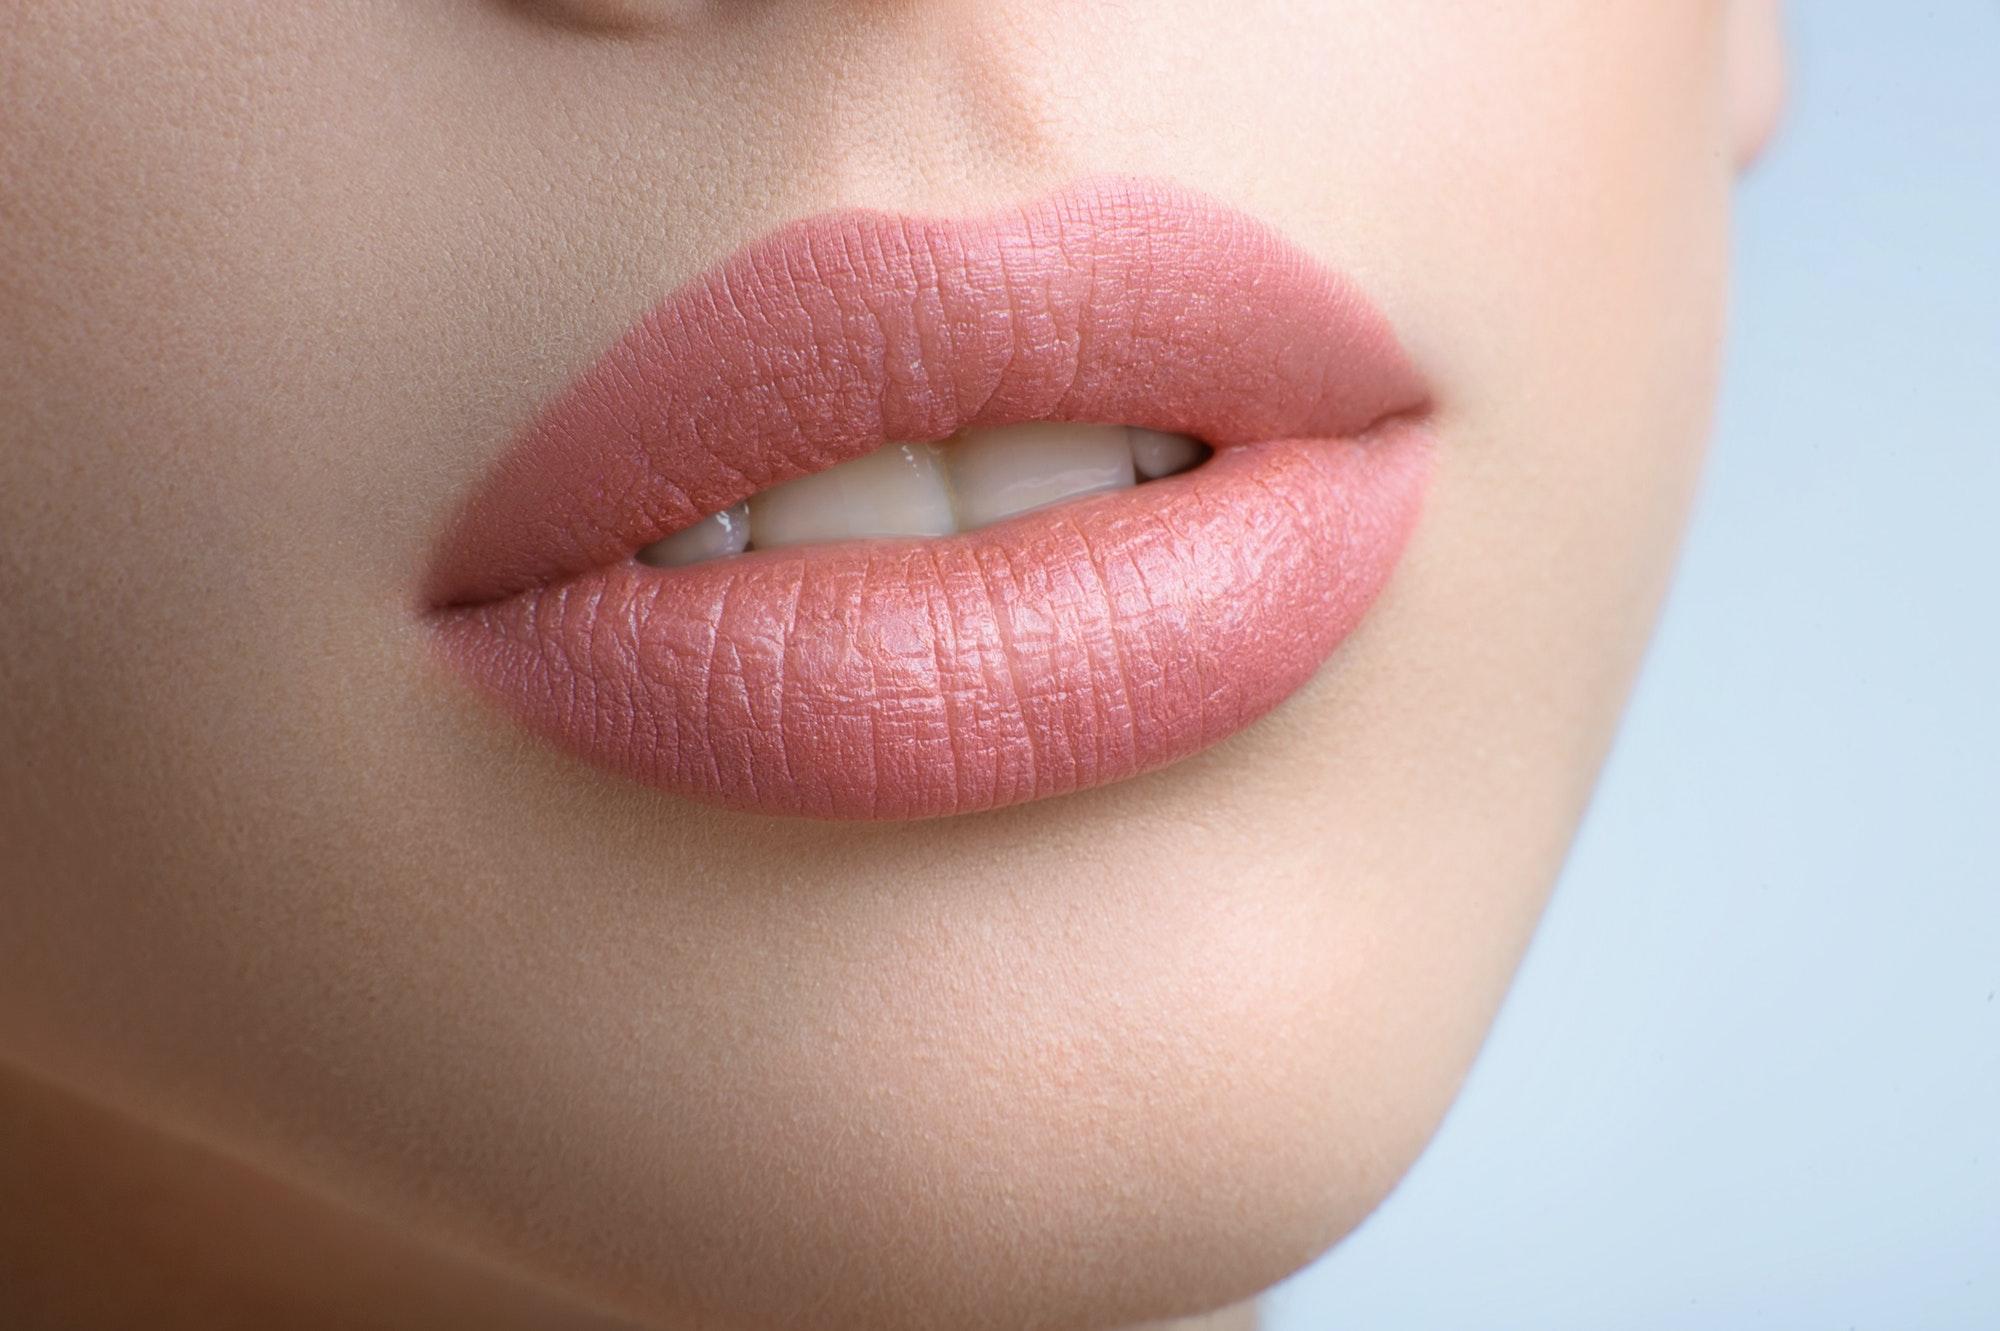 Gorgeous full lips of a beautiful woman